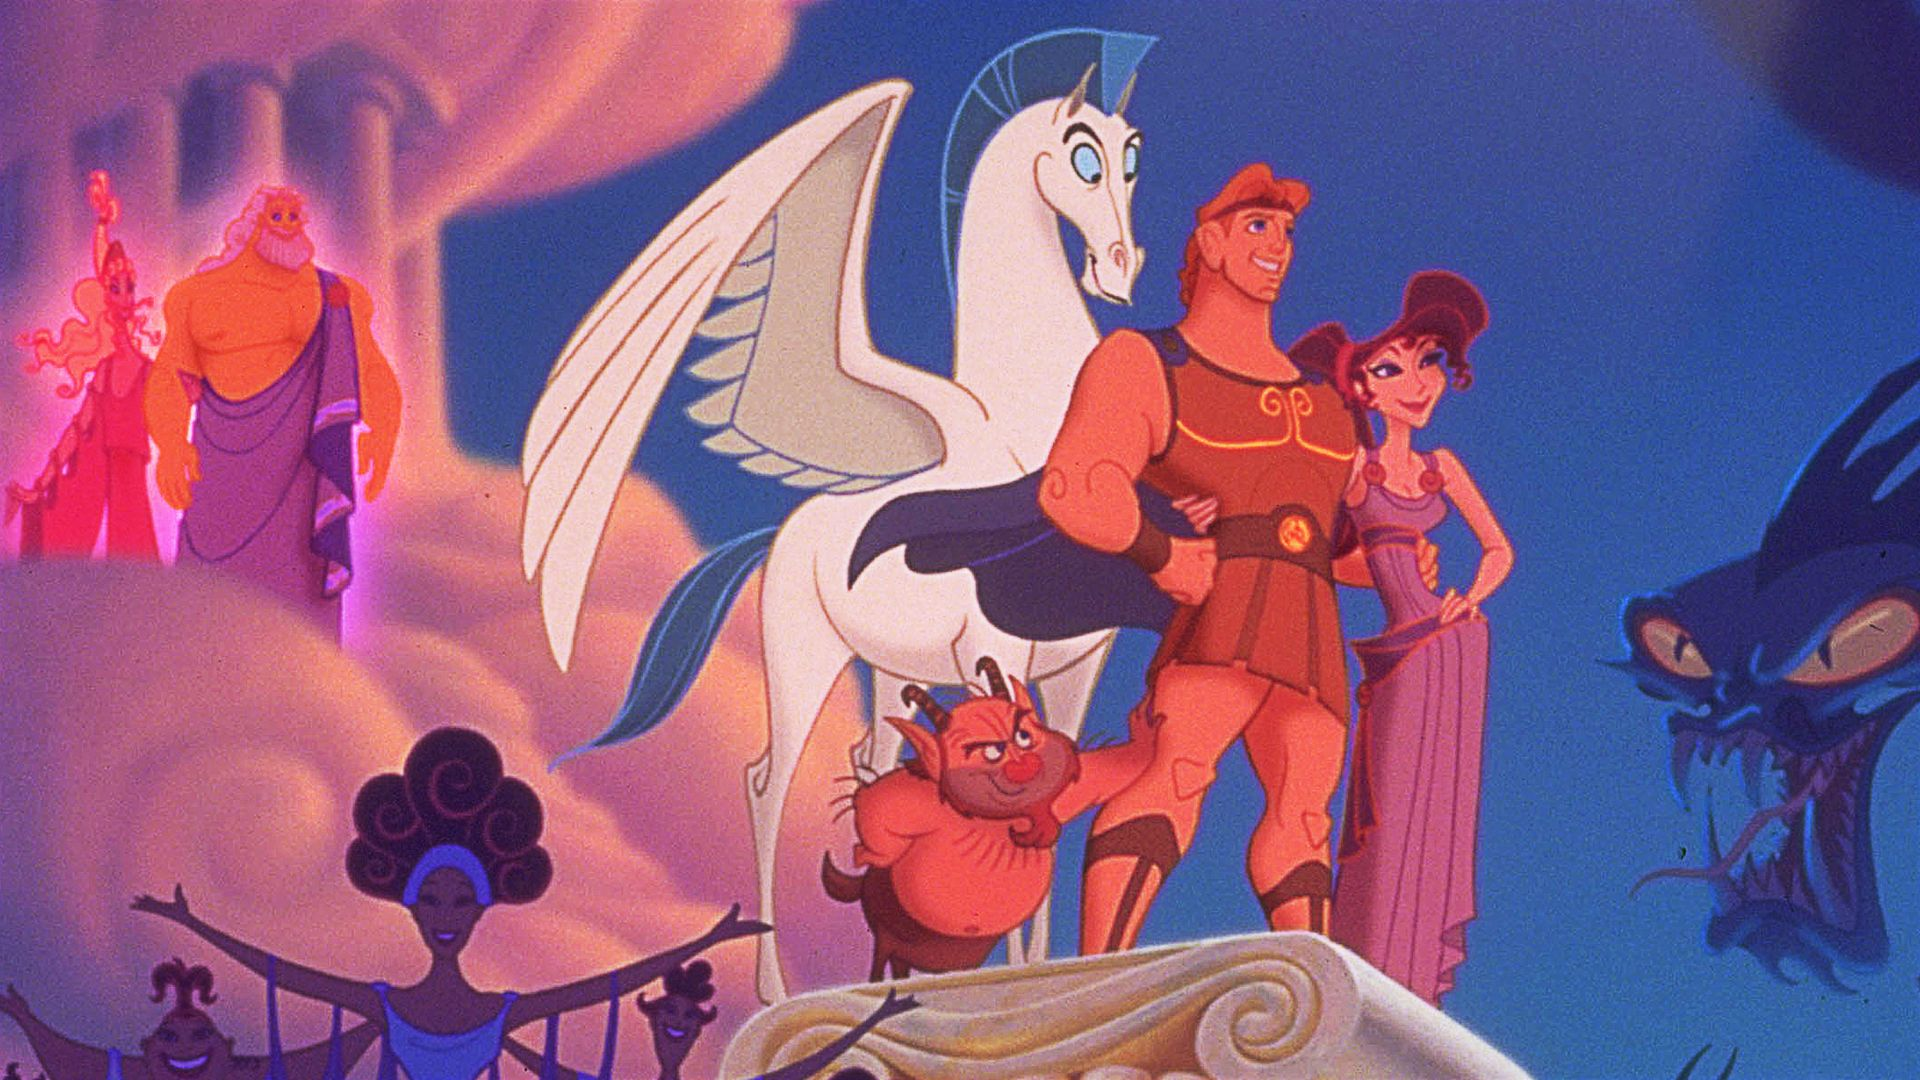 Watch Hércules | Full Movie | Disney+